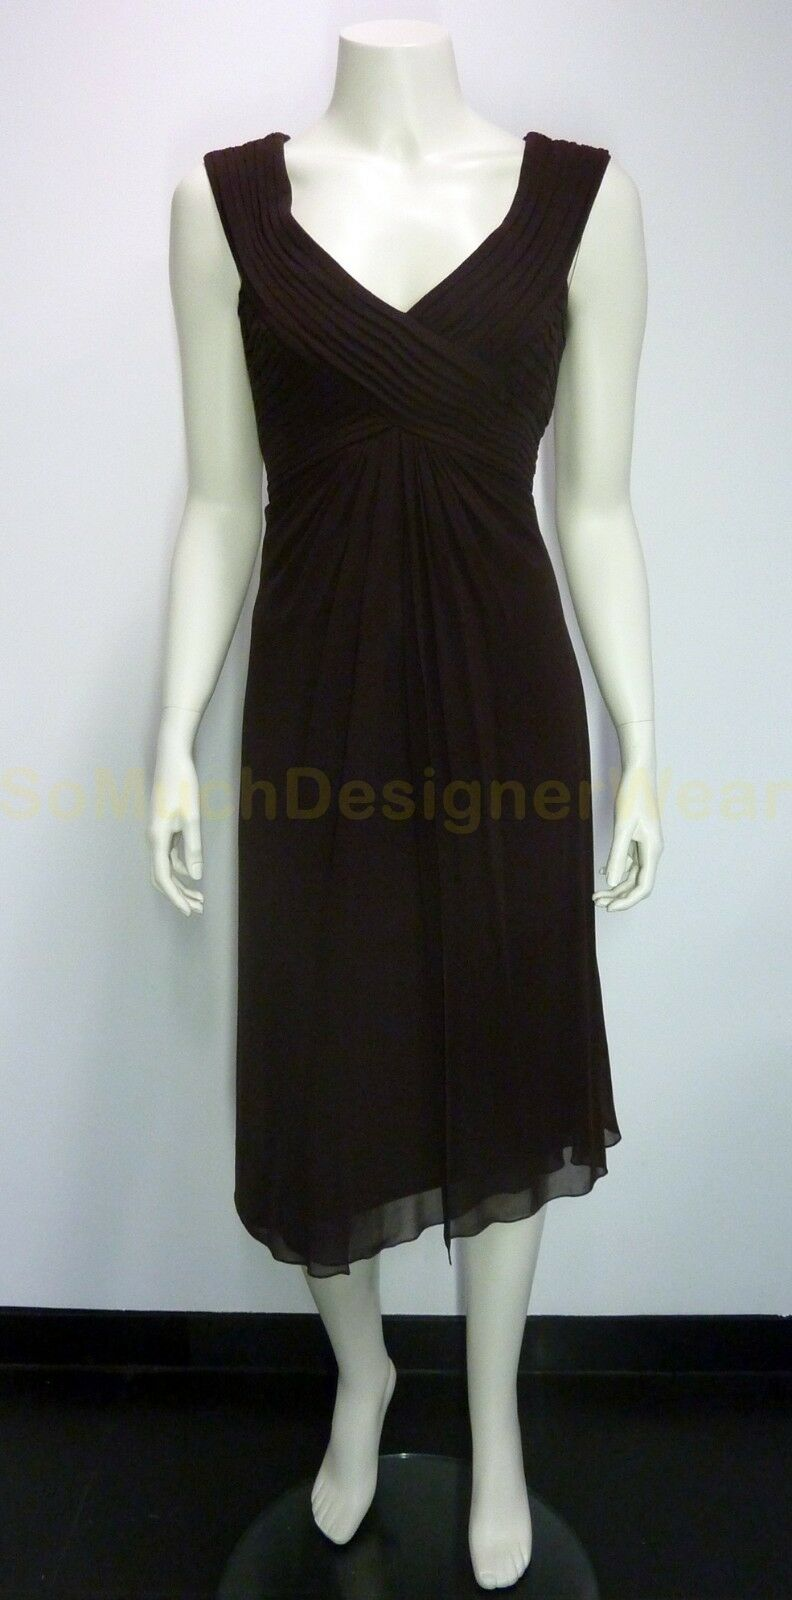 TADASHI jurk US8 EU36 donkerbruin NIEUW+LABELS ap  275